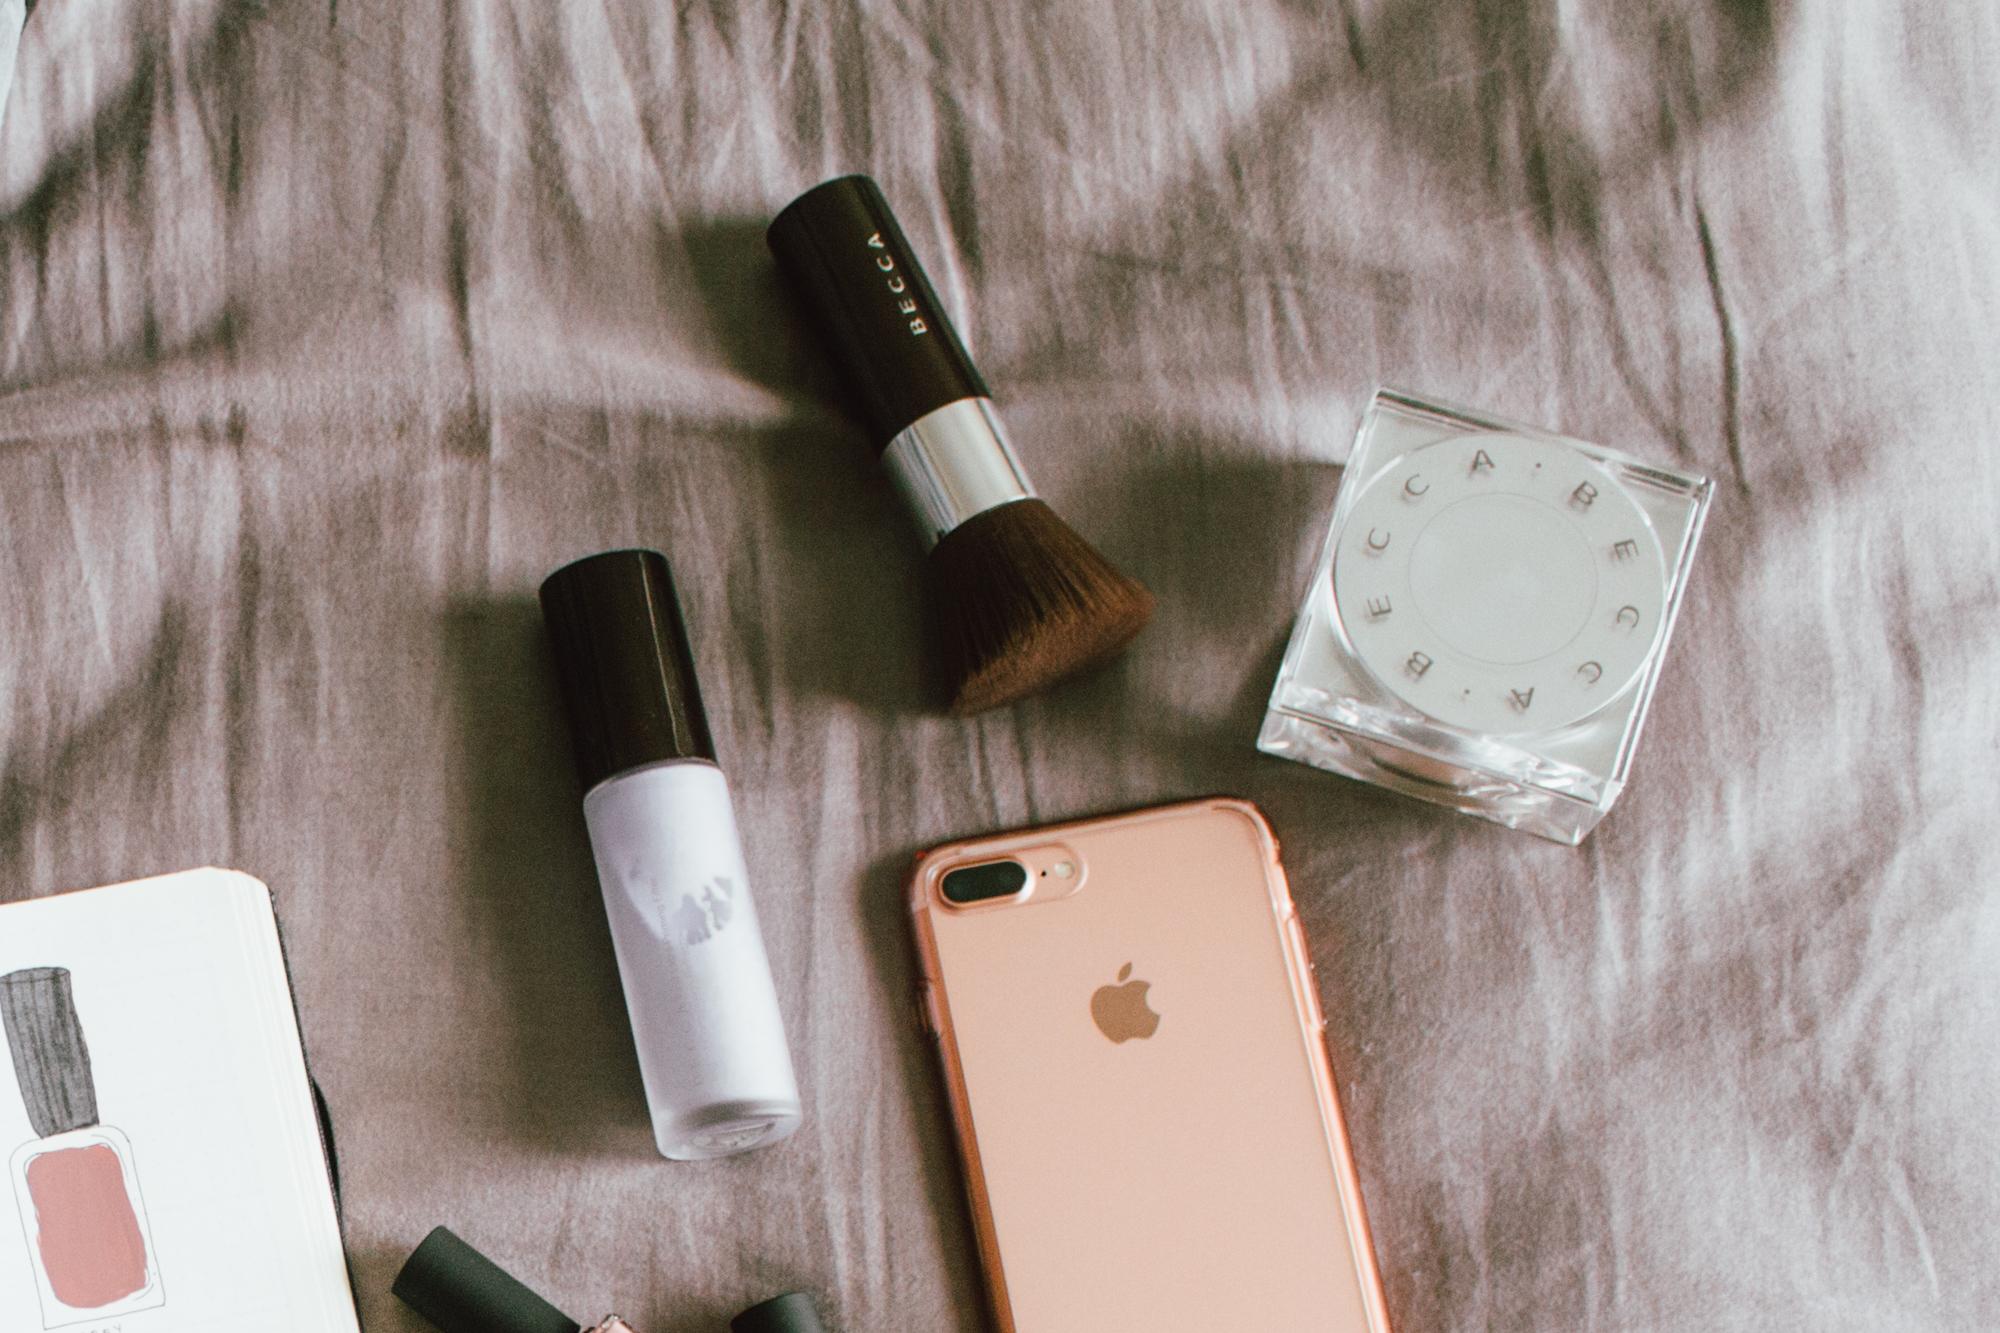 Becca Cosmetics x Influenster